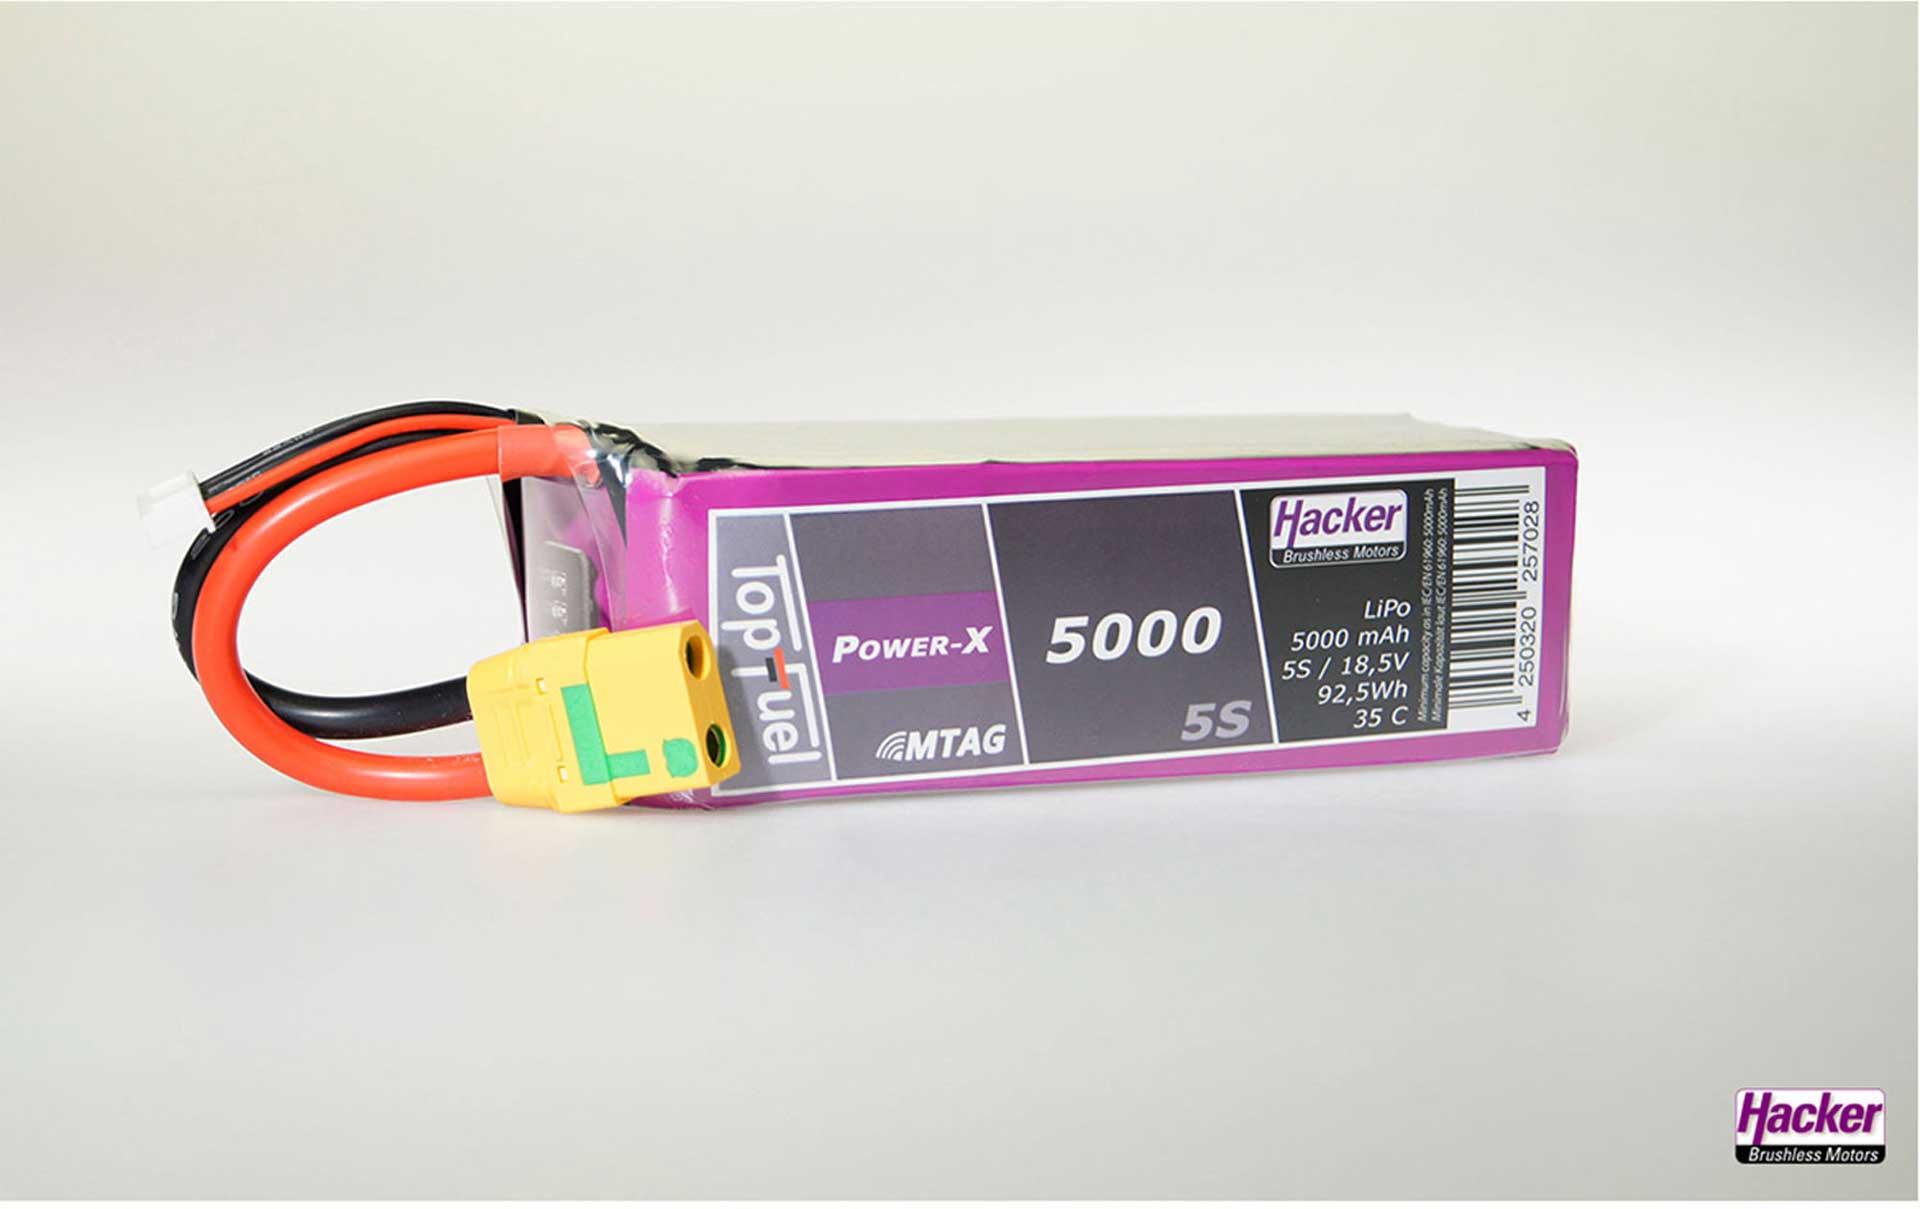 TOPFUEL LIPO 35C POWER-X 5000MAH 5S MTAG XT-90-S